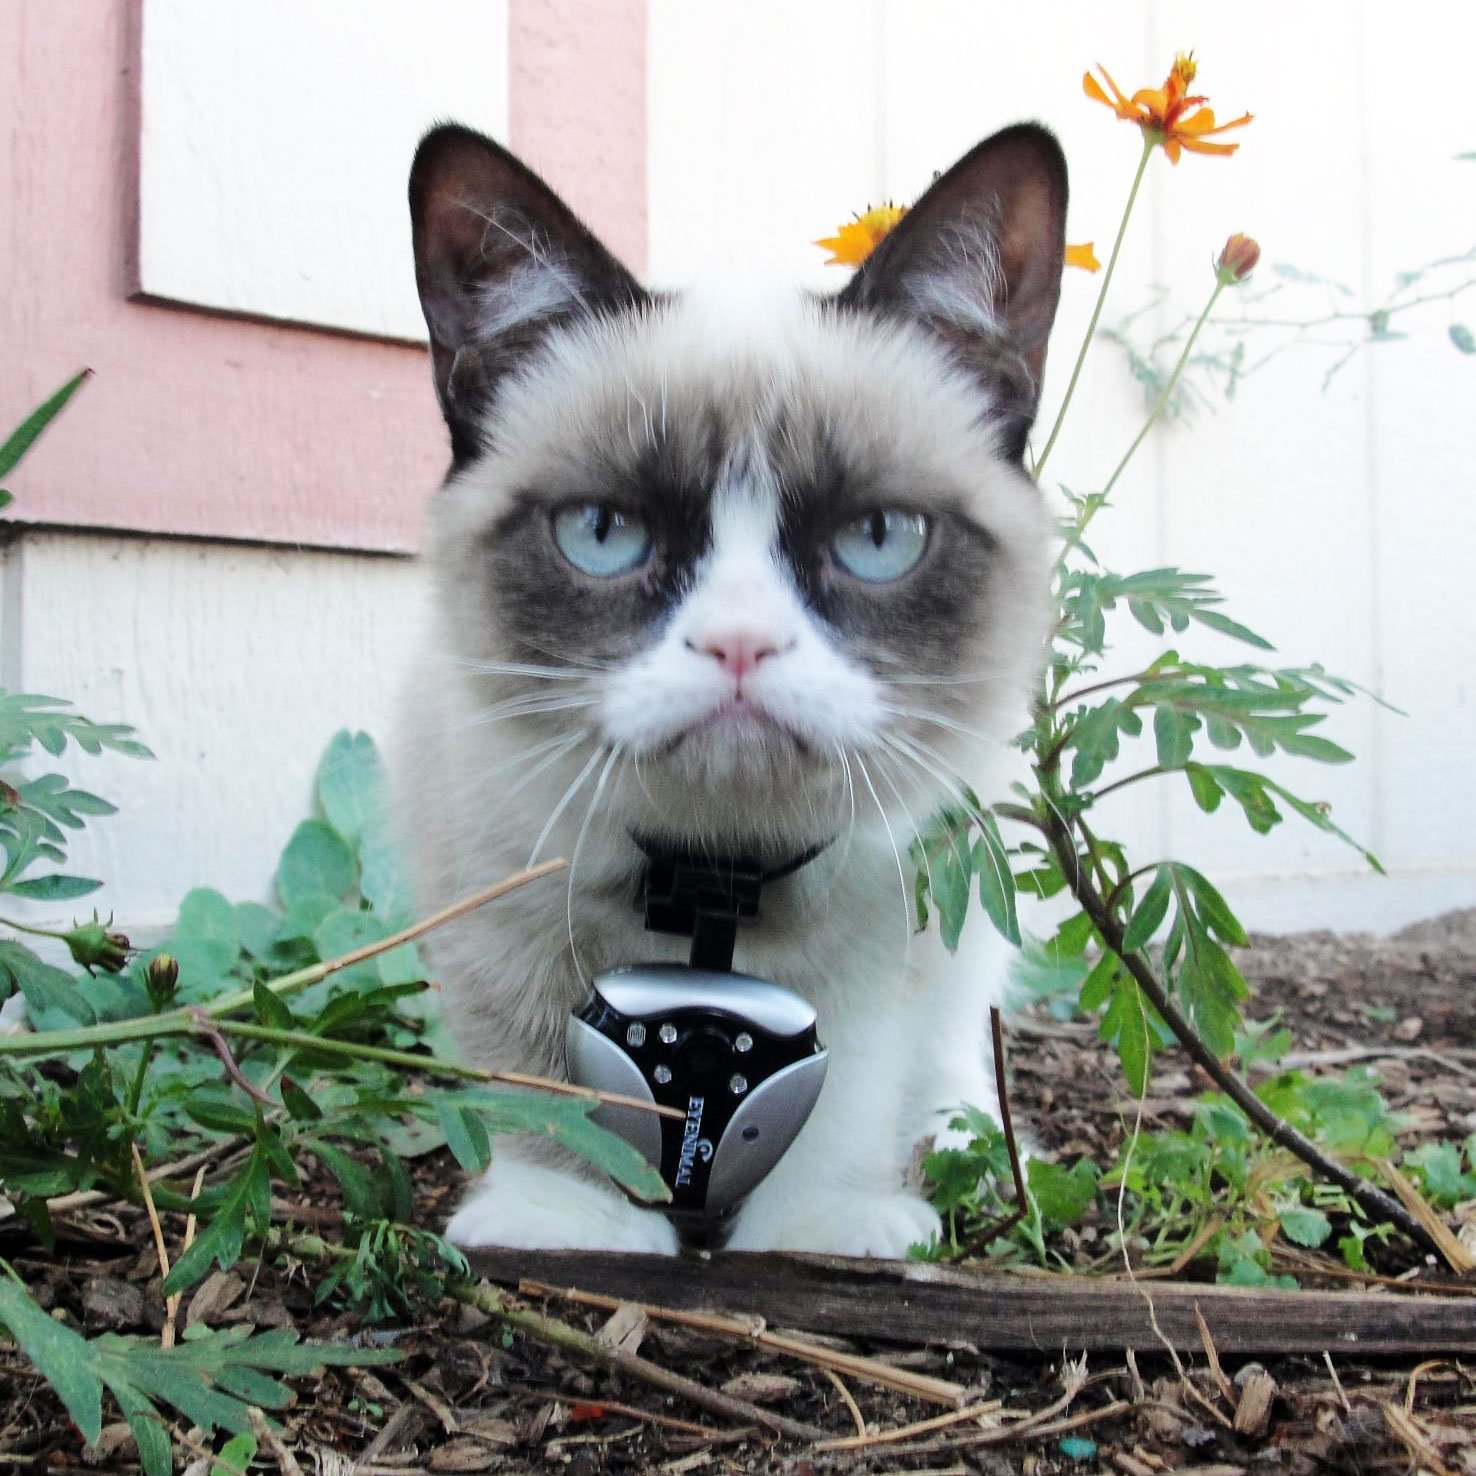 DOGTEK Eyenimal Cat Video Camera with Night Vision